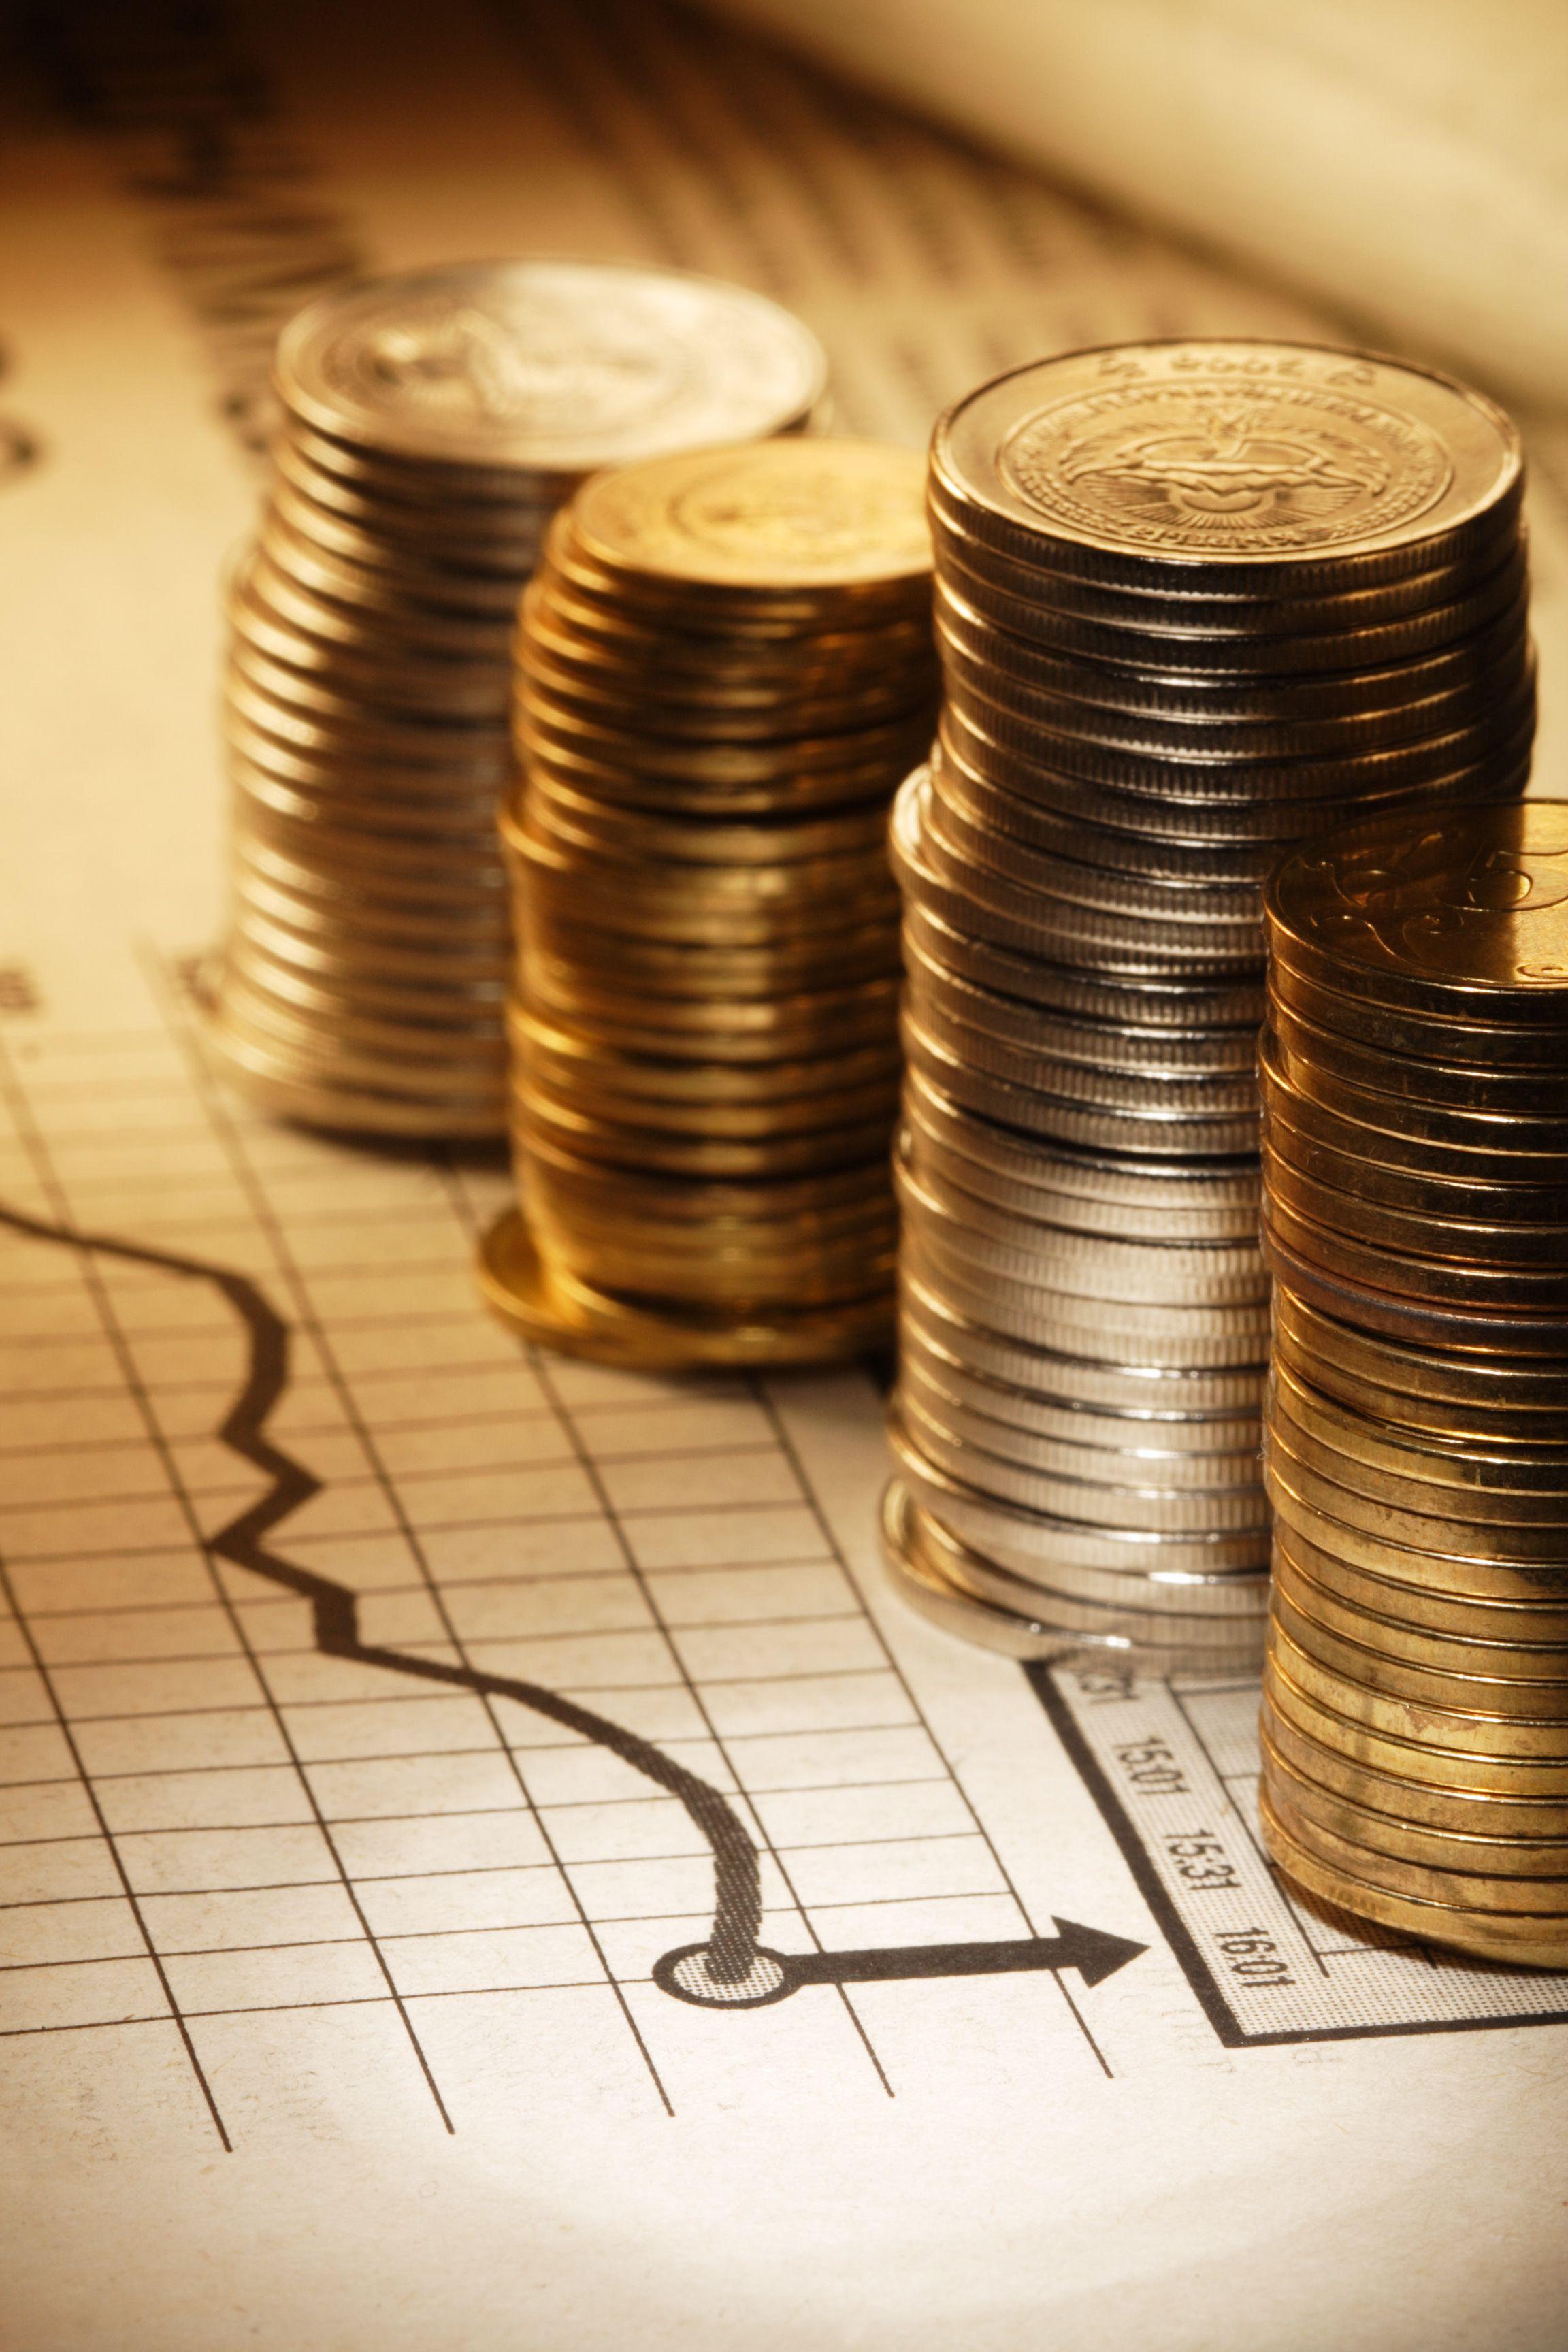 В Казахстане ожидается рост экономики- Kapital.kz